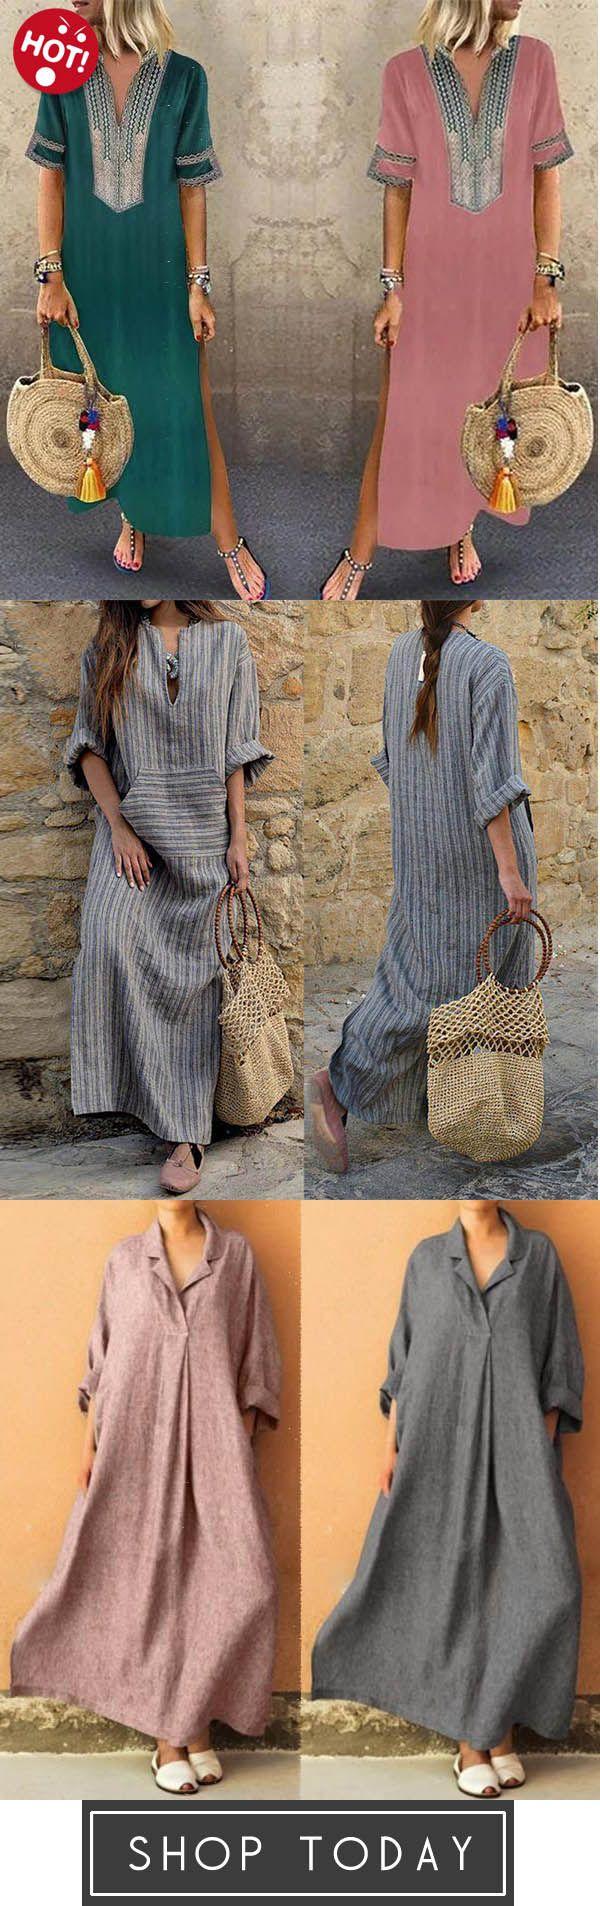 f677a879d1b V neck Shift Women Daily Statement Half Sleeve Slit Solid Summer Dress